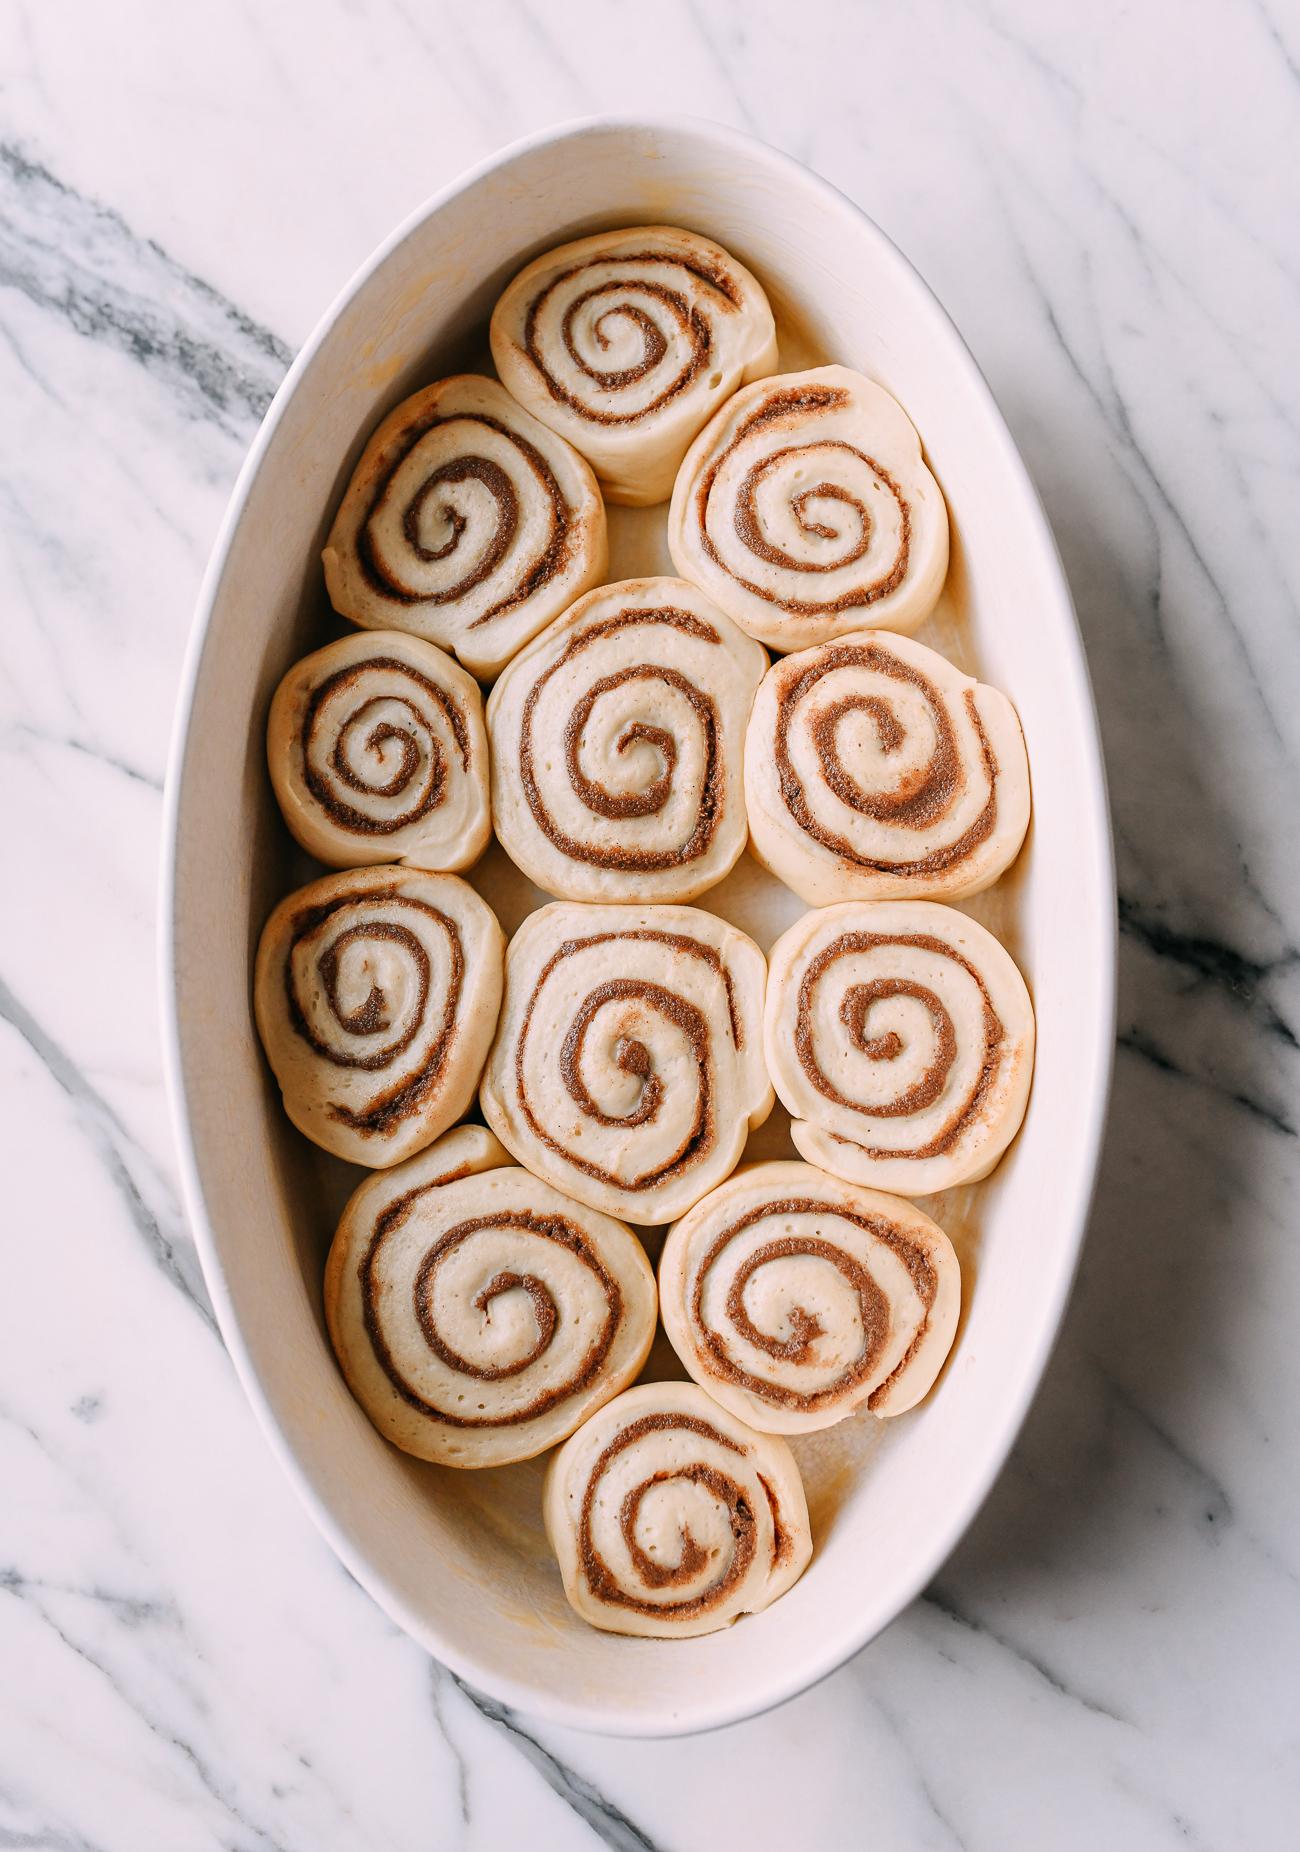 Proofed cinnamon rolls